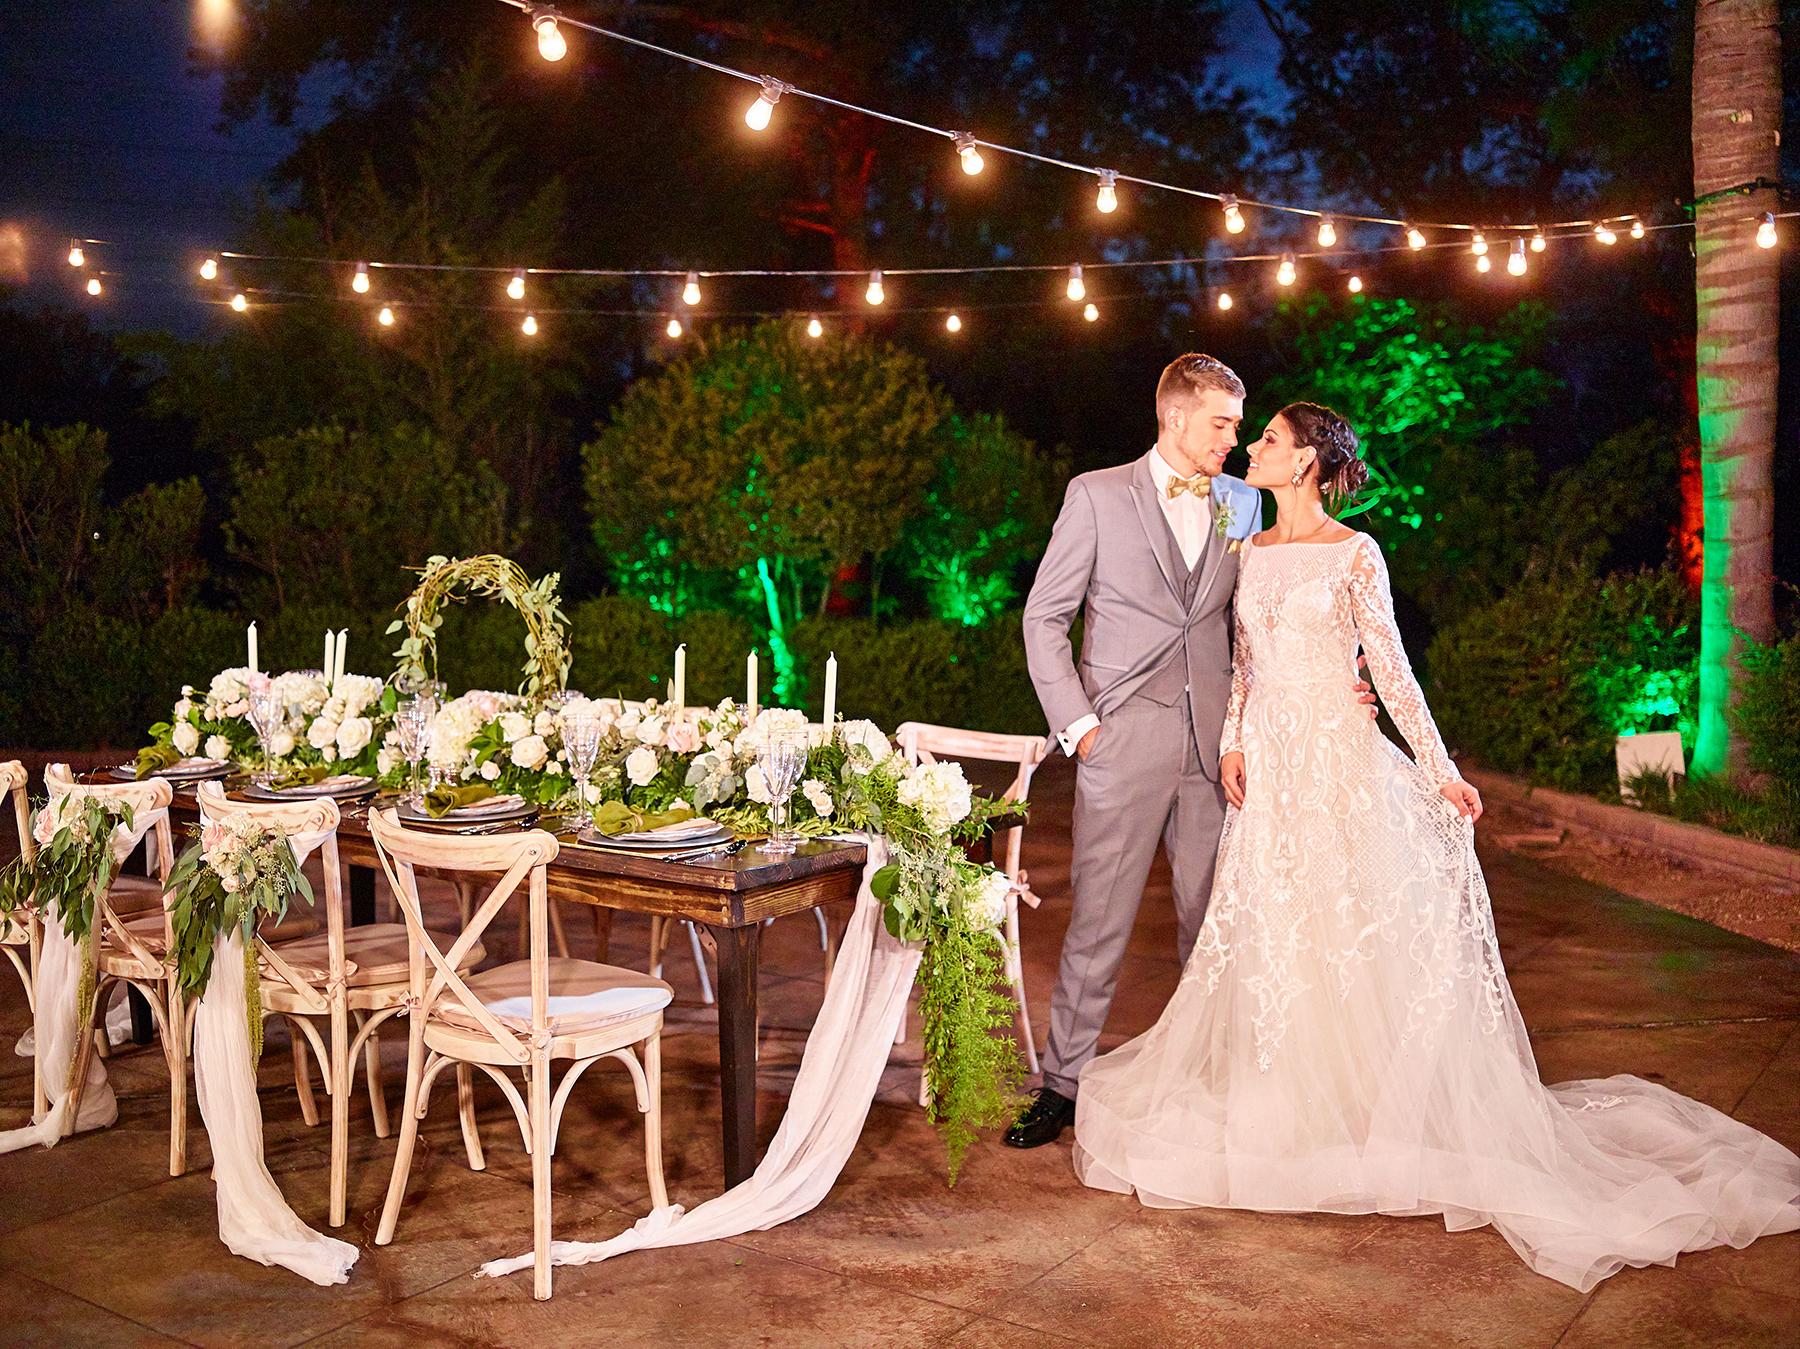 daytoremember.net | Civic Photo Studios | Chateau Polonez | Weddings in Houston Magazine | Houston, Texas | A Day To Remember Houston Luxury Wedding Planning and Design